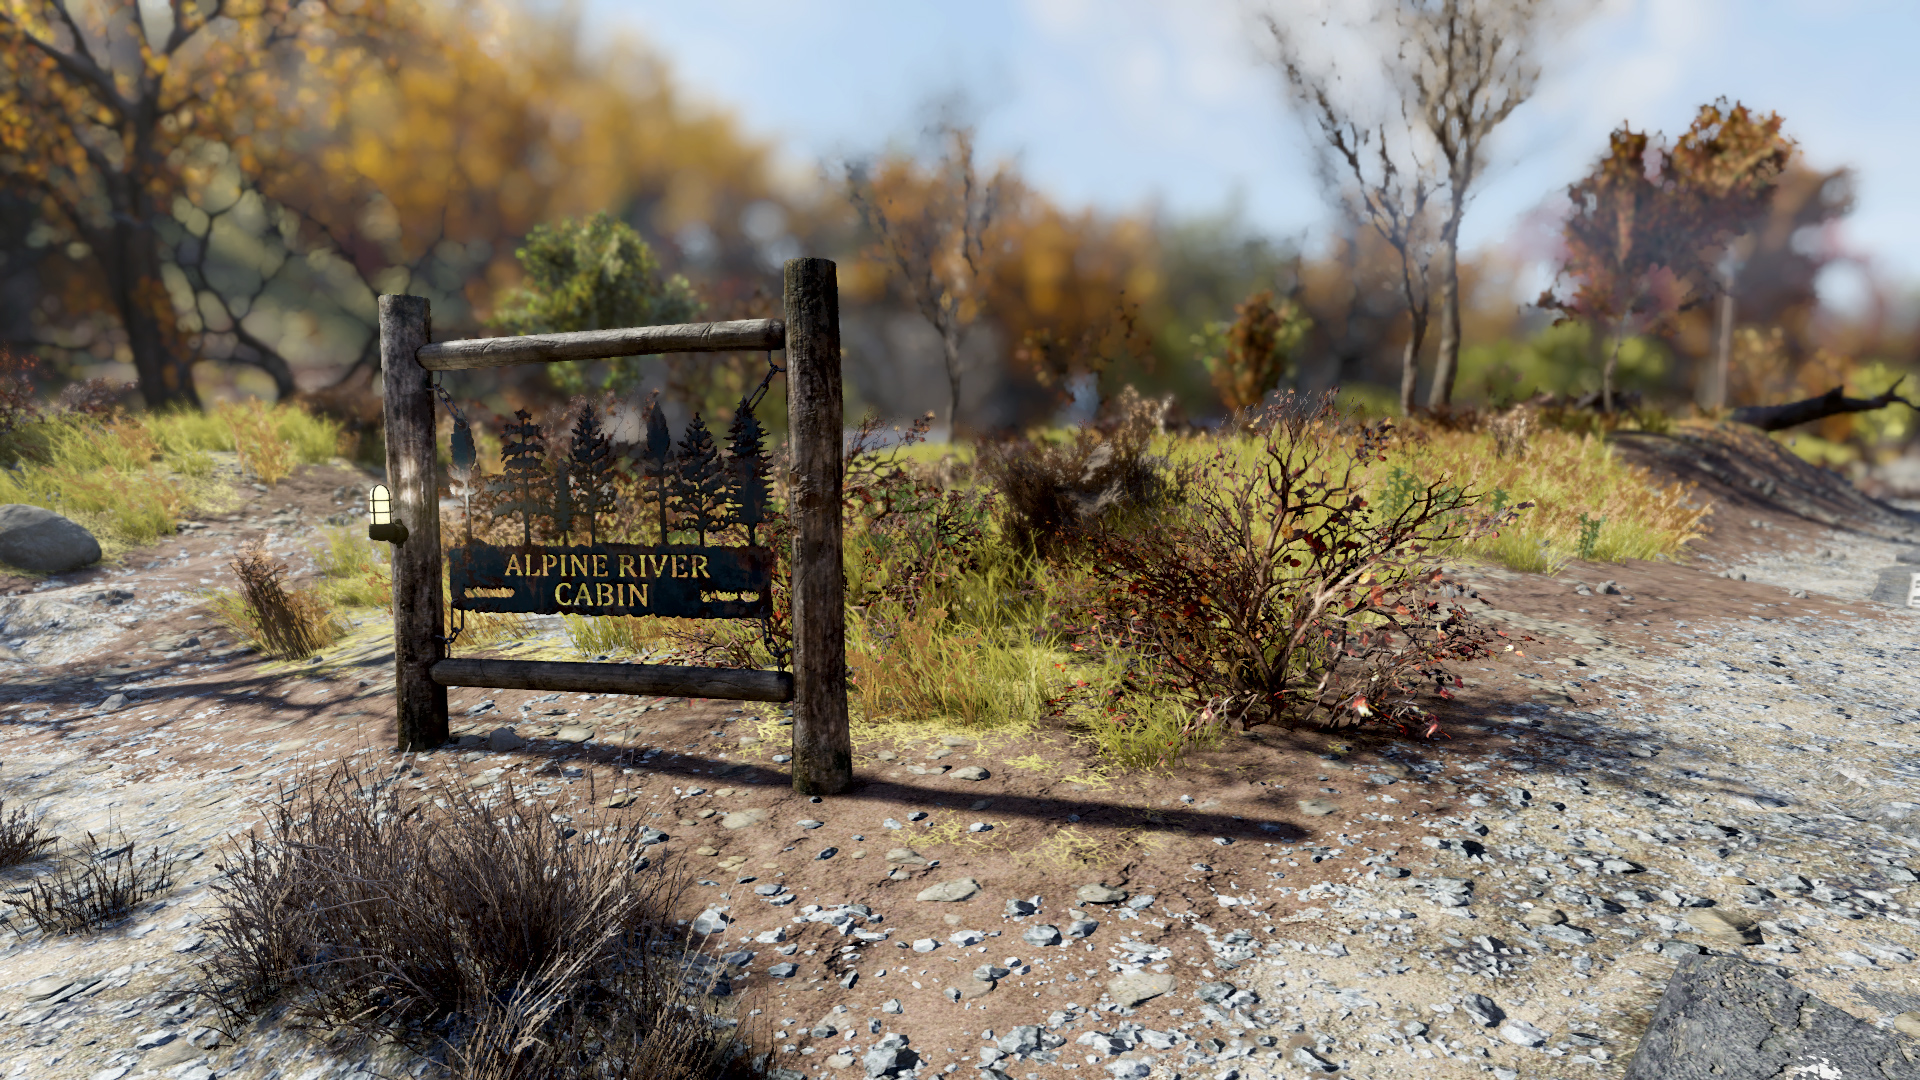 Fo76 Alpine River Cabins sign